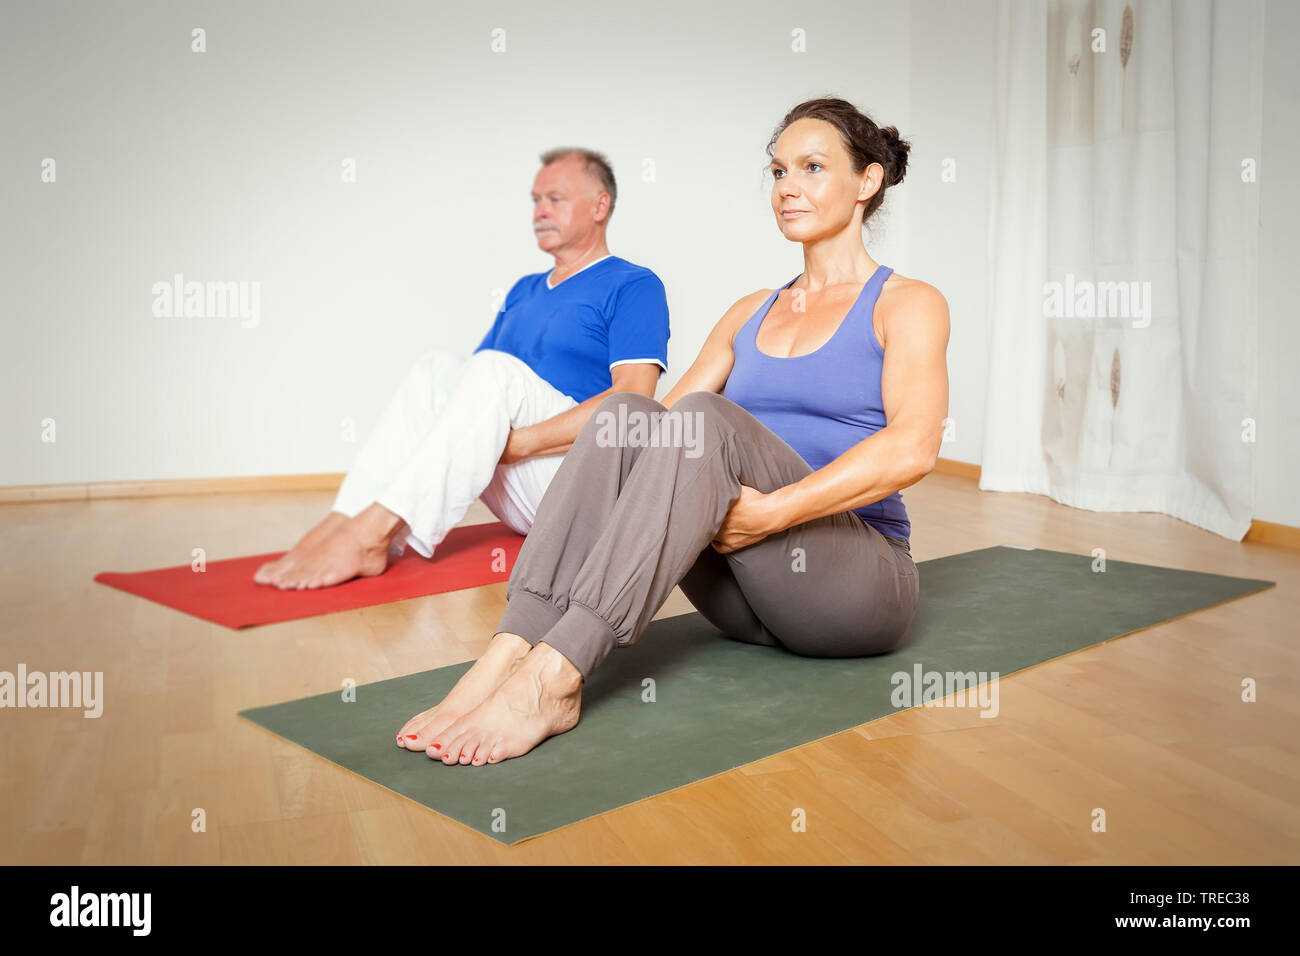 Frau und Mann machen Yoga-Uebungen, Europa | woman and man doing yoga, Europe | BLWS522588.jpg [ (c) blickwinkel/McPHOTO/M. Gann Tel. +49 (0)2302-2793 - Stock Image